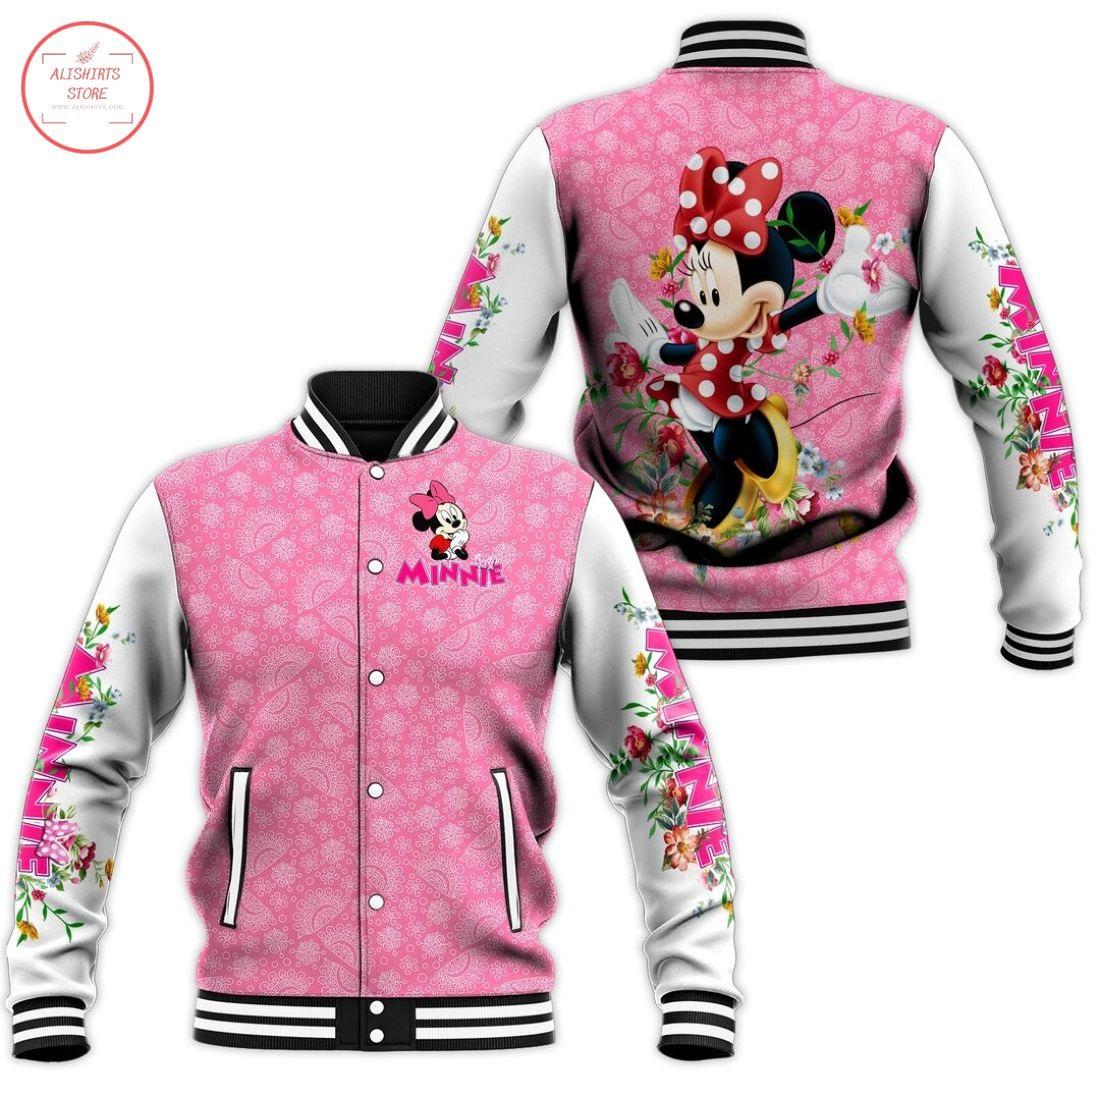 Disney Minnie Mouse Letterman Jacket